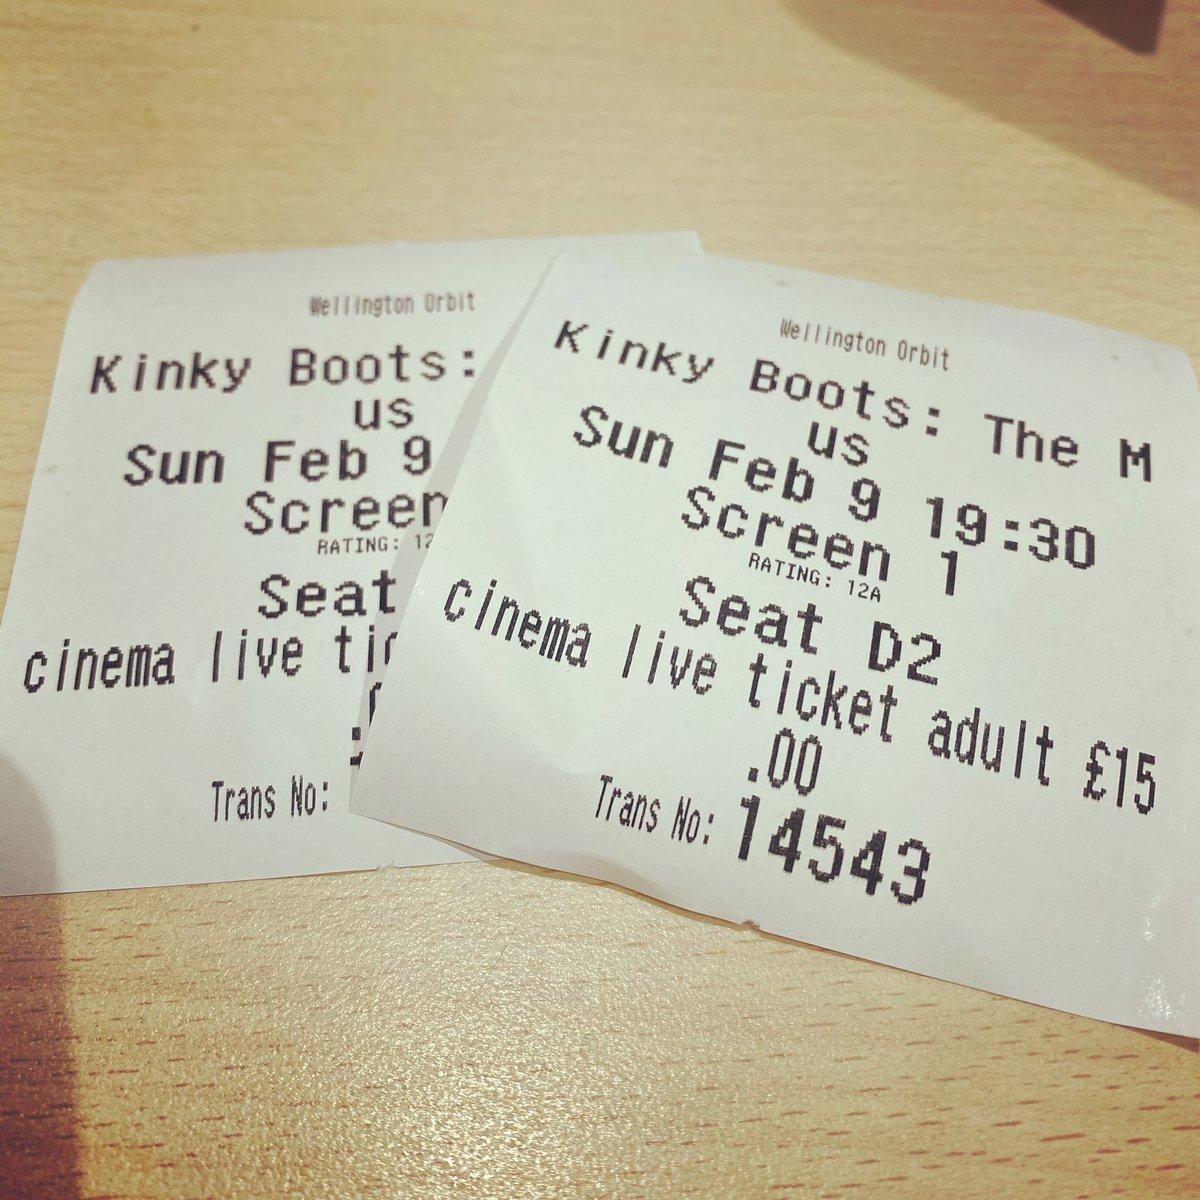 Kinky Boots with my girl   .  #star #actors #actor #shakespeare #movies #moviestar #cinema #actorslife #actress #instamovies #musical #goodmovie #stage #westend #teatro #flick #videos #flicks #broadway #instaflick #theater #instaflicks #actingpic.twitter.com/G05Uk3mKro